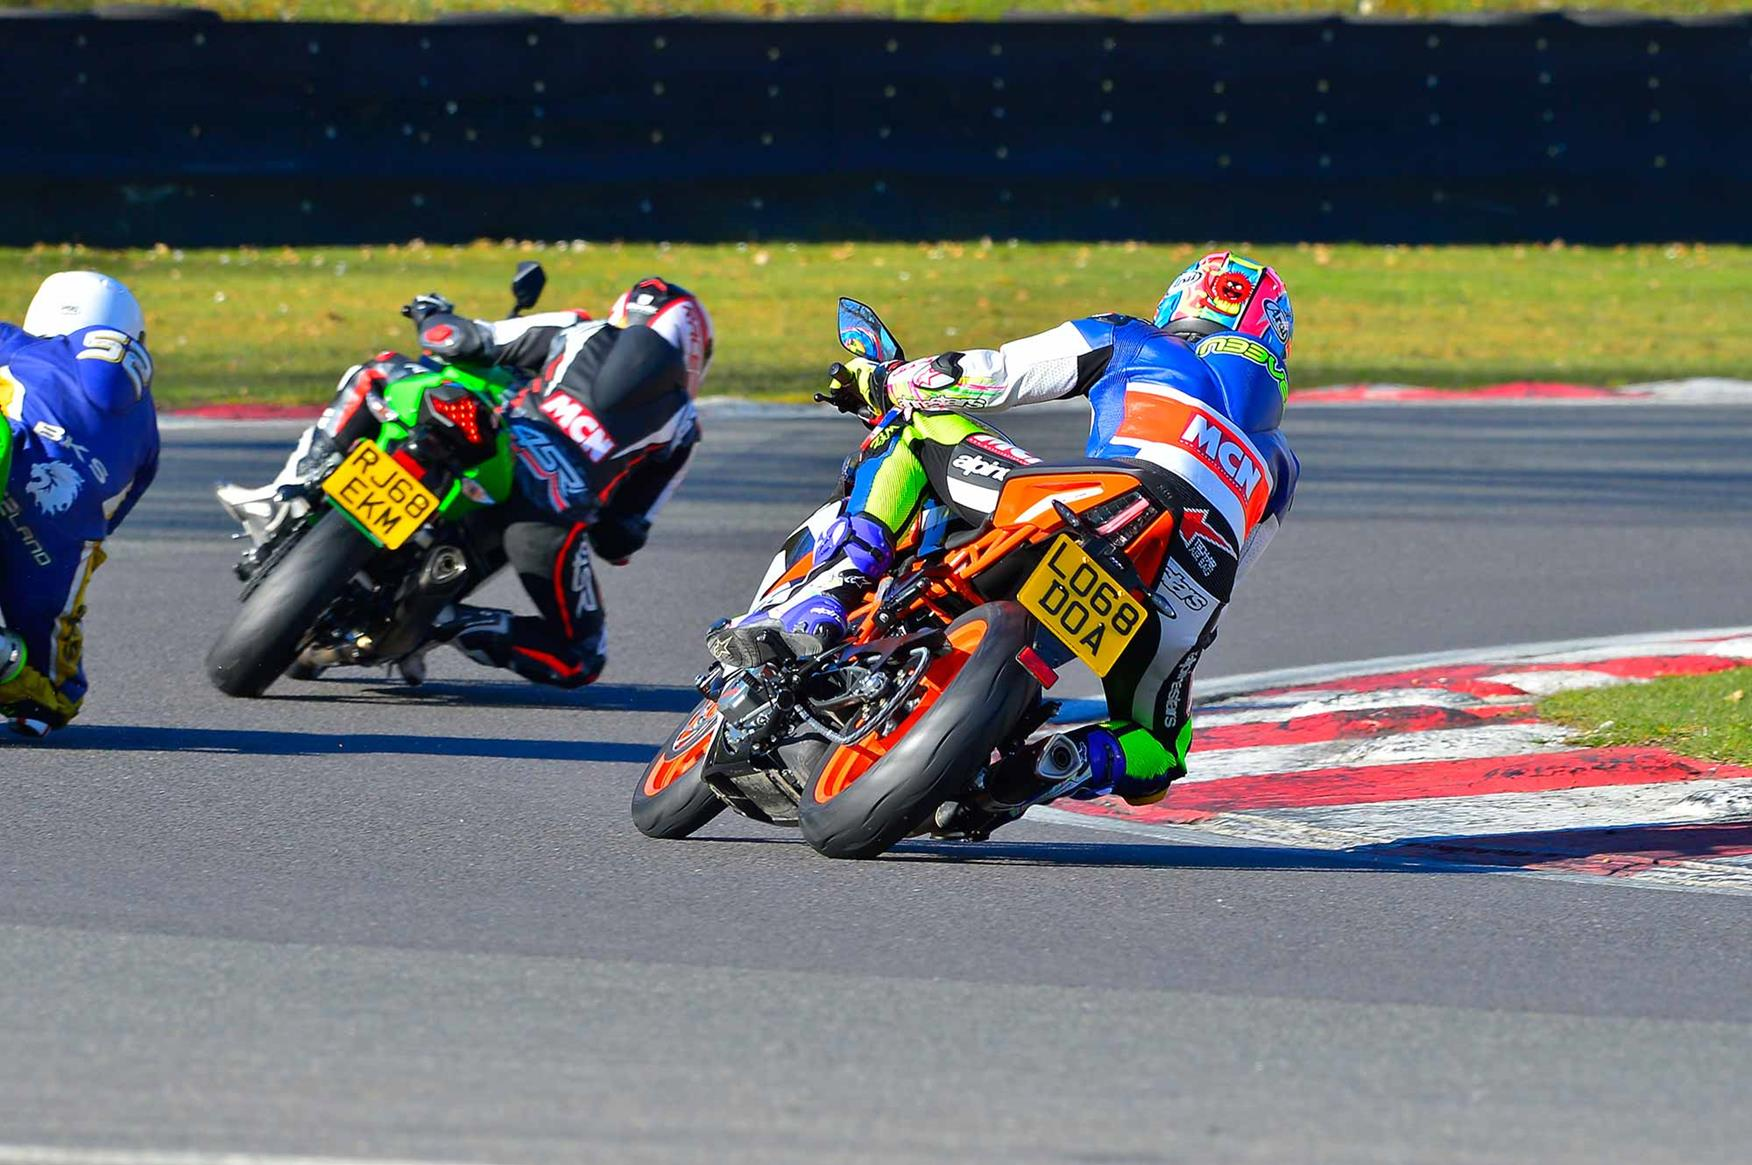 Cornering on the Kawasaki and KTM